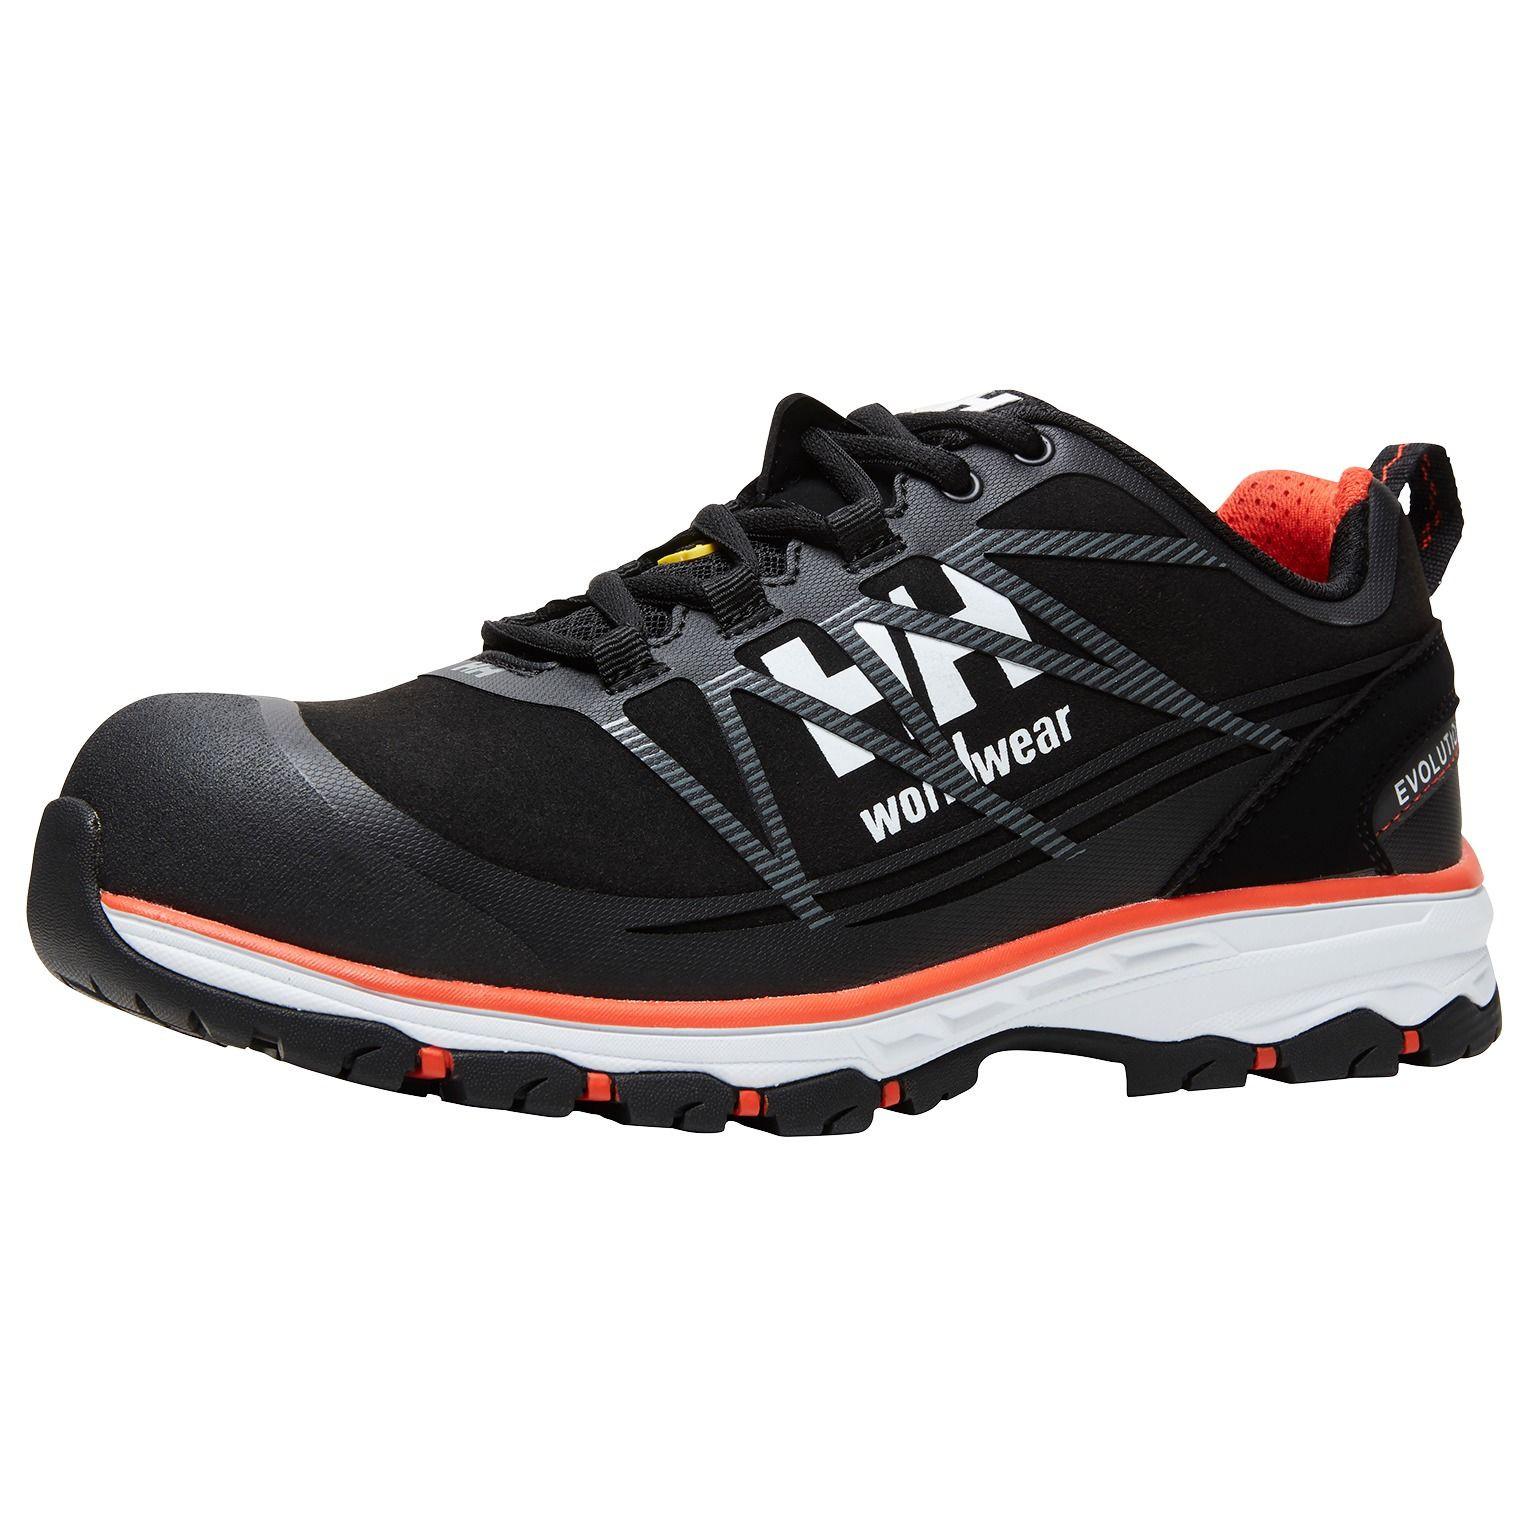 Демисезонные ботинки Helly Hansen Chelsea Evolution Low - 78224 (Black / Orange; 43)